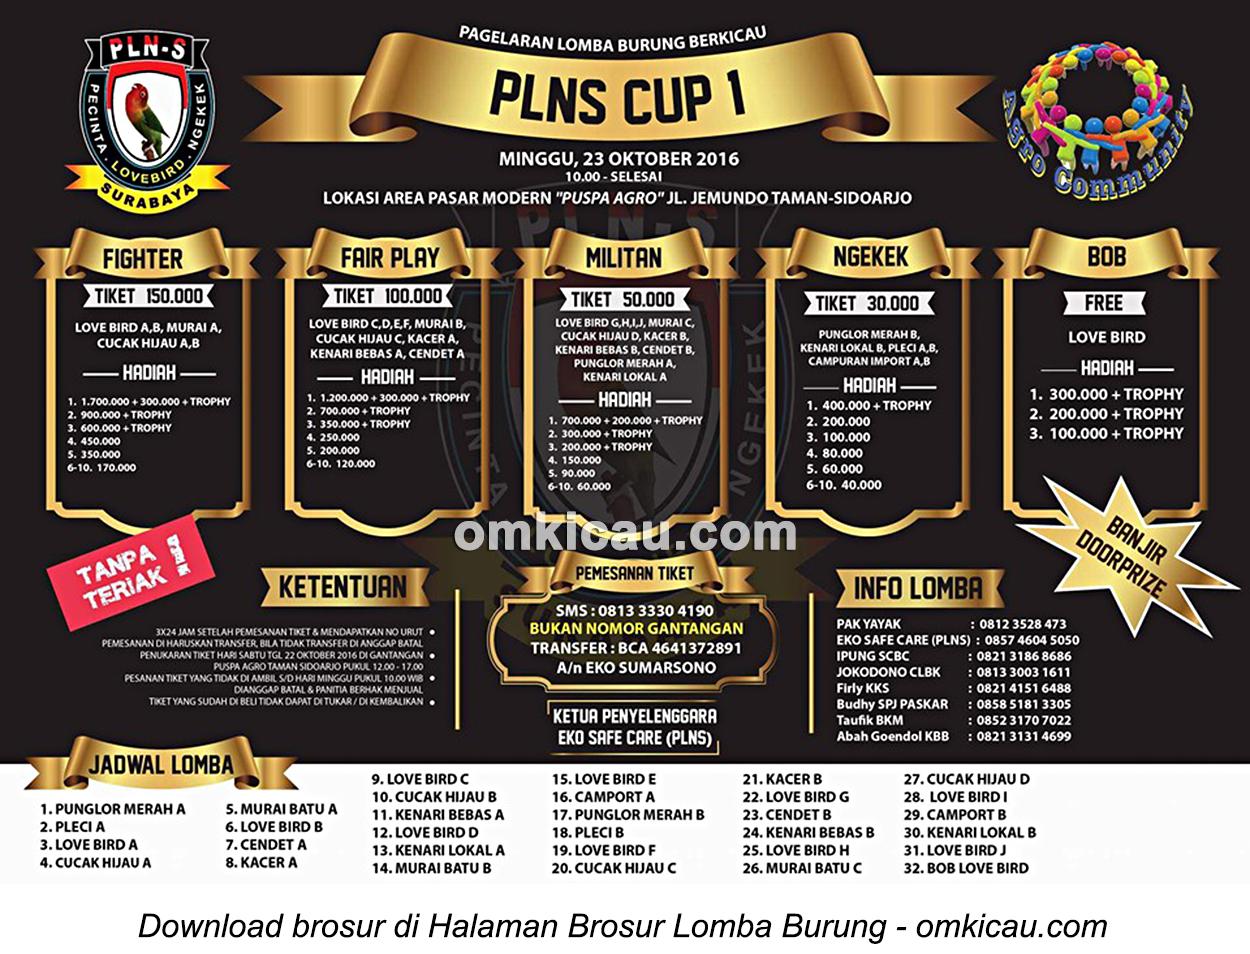 Brosur Lomba Burung Berkicau PLNS Cup 1, Sidoarjo, 23 Oktober 2016